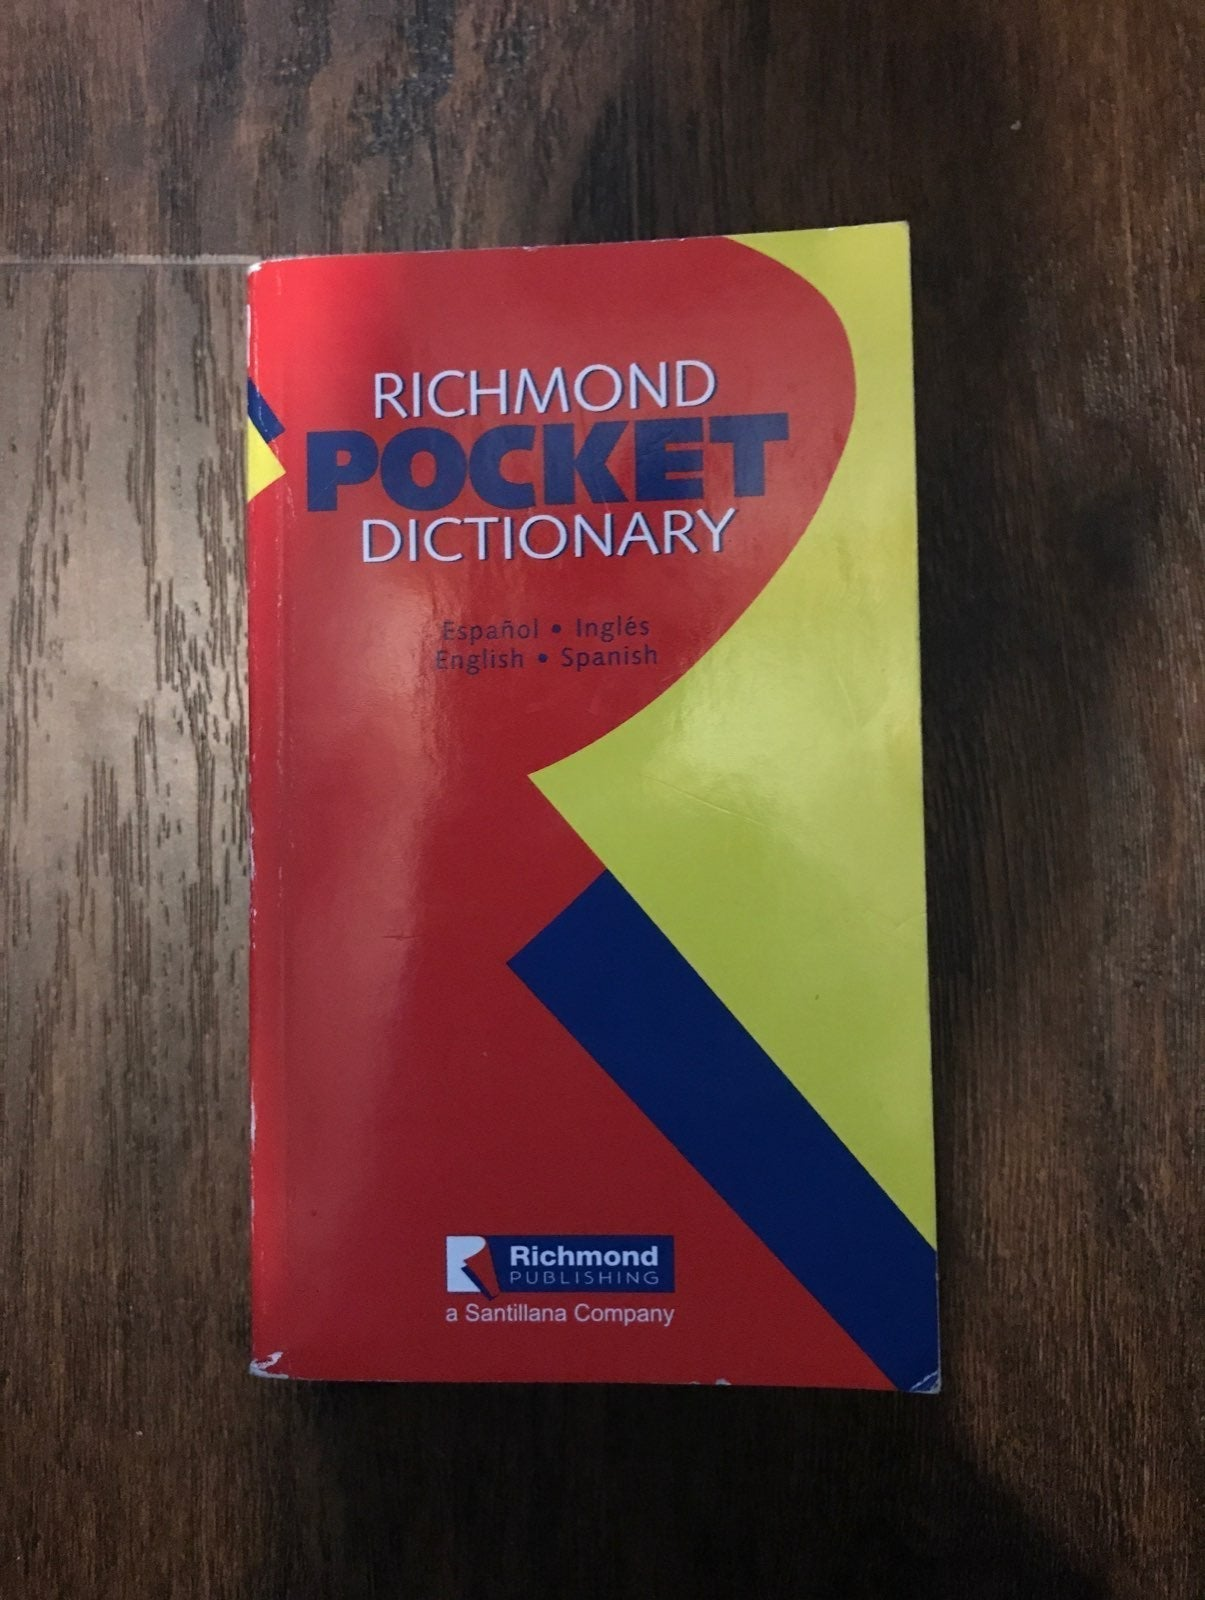 Richmond pocket dictionary